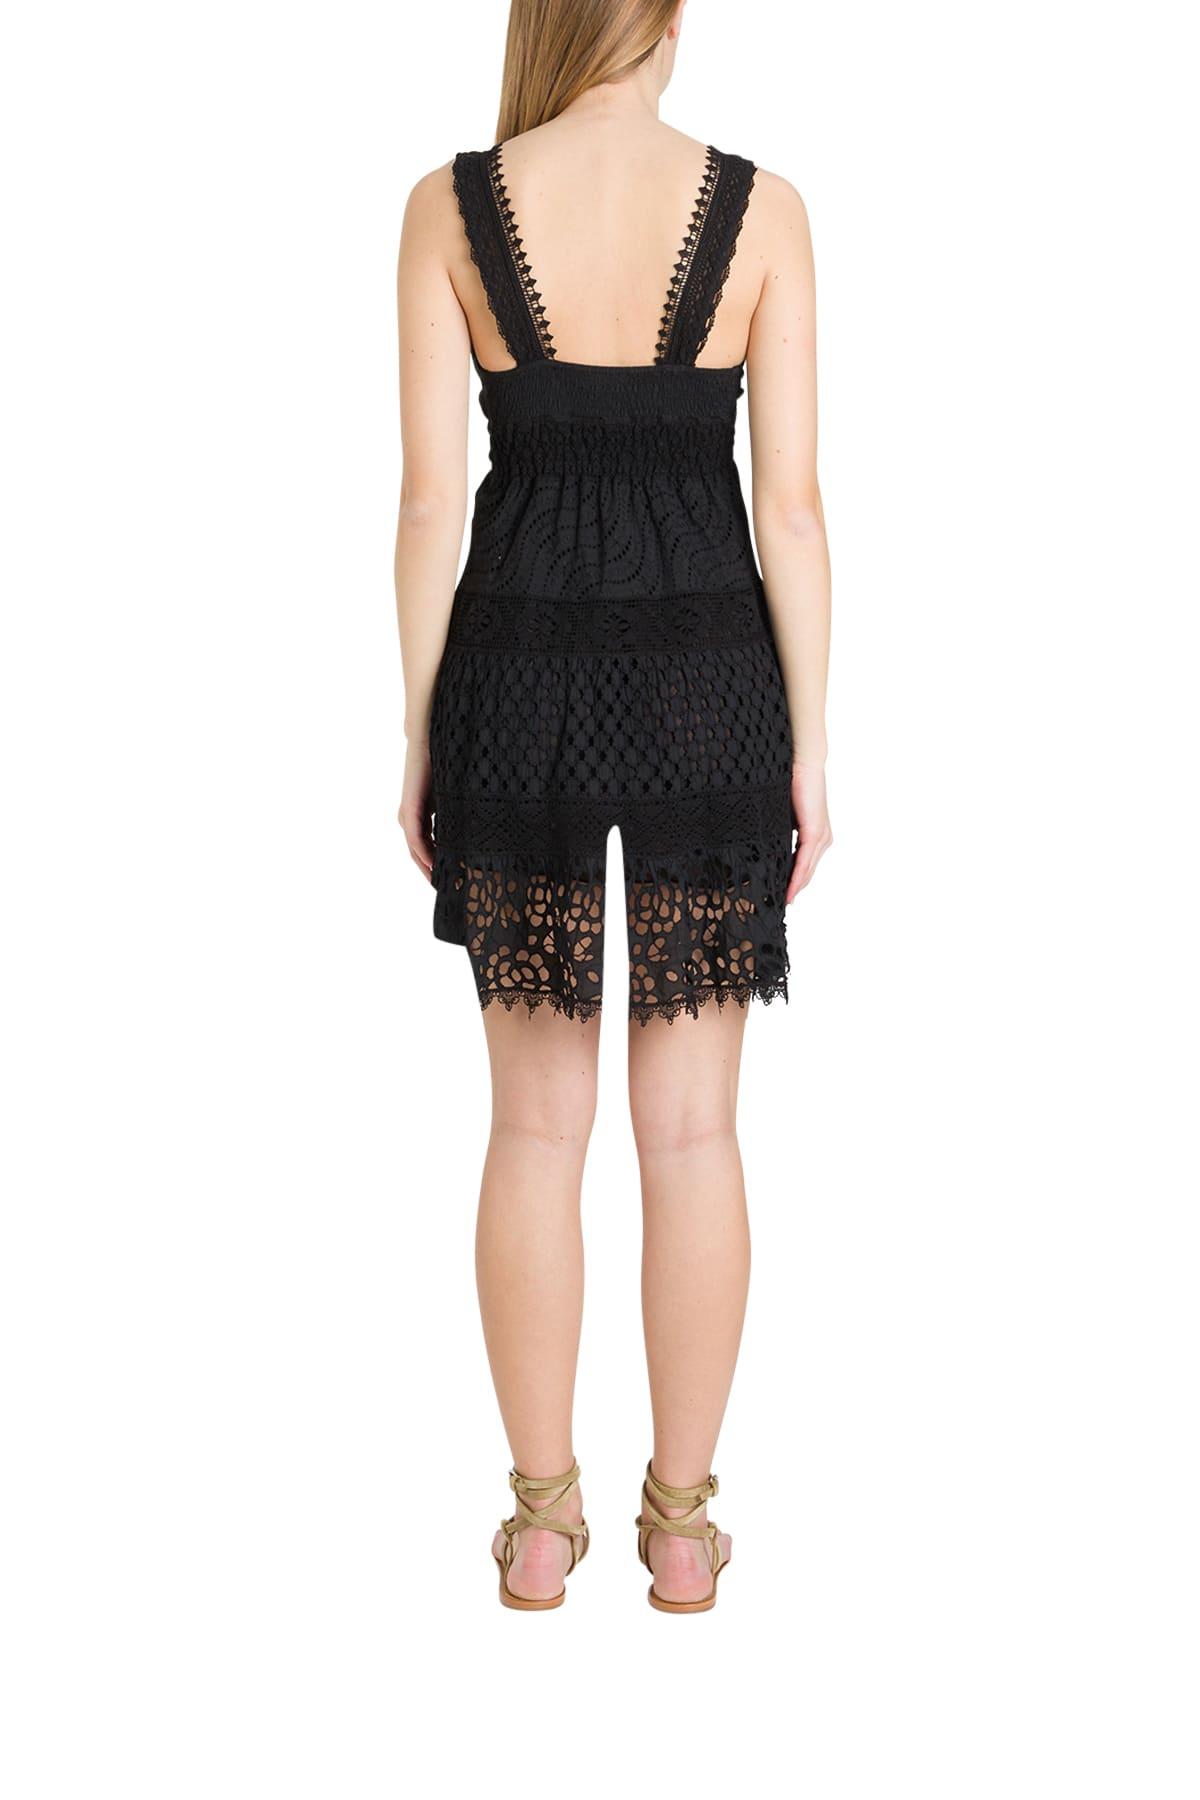 Buy Temptation Positano Tampico Dress online, shop Temptation Positano with free shipping